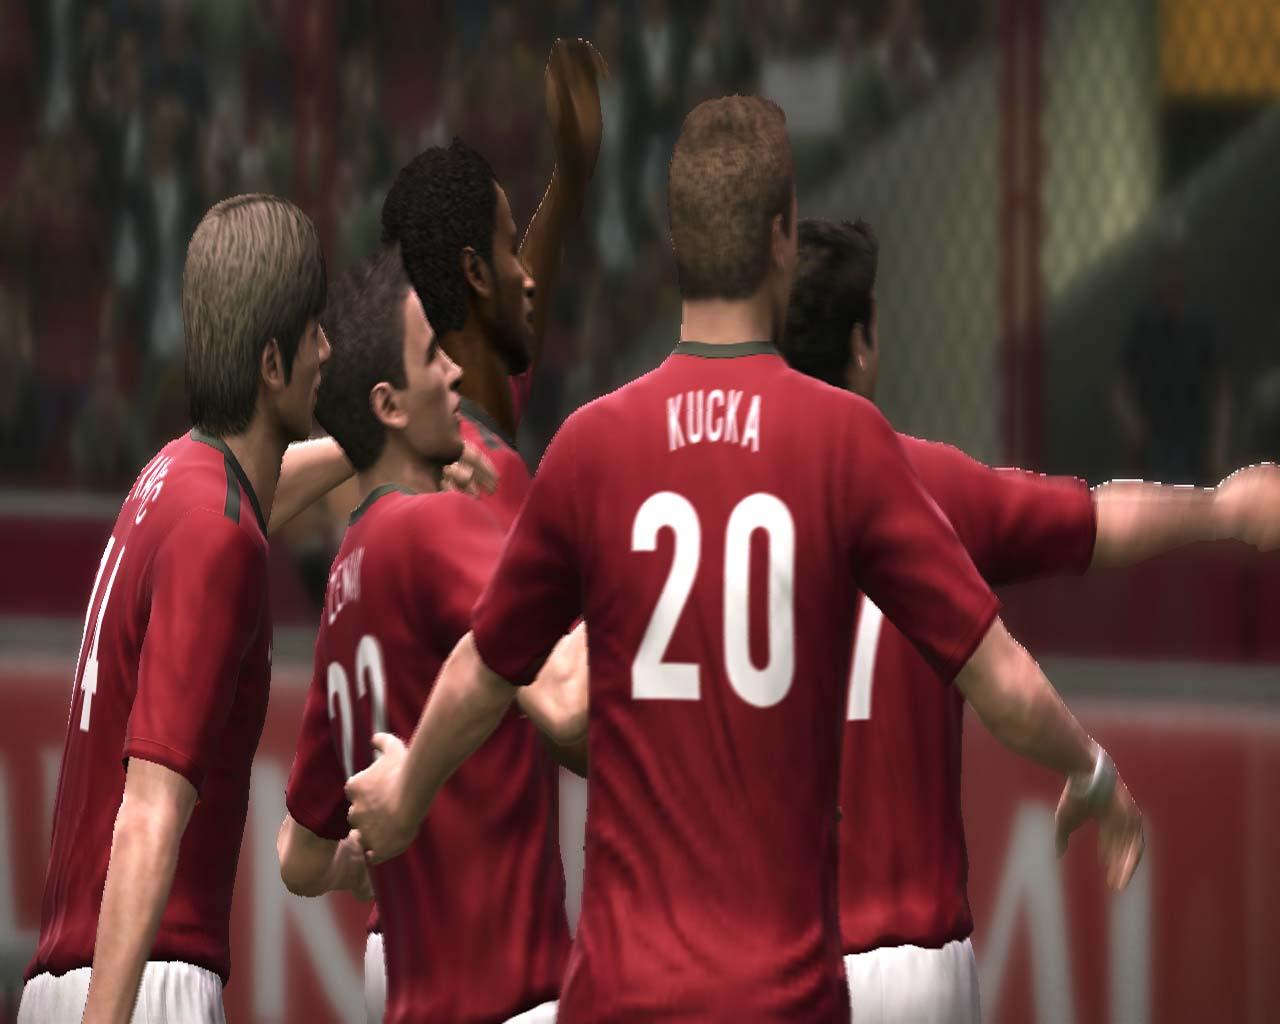 Pro Evolution Soccer 2011 - král je mrtev? 23552